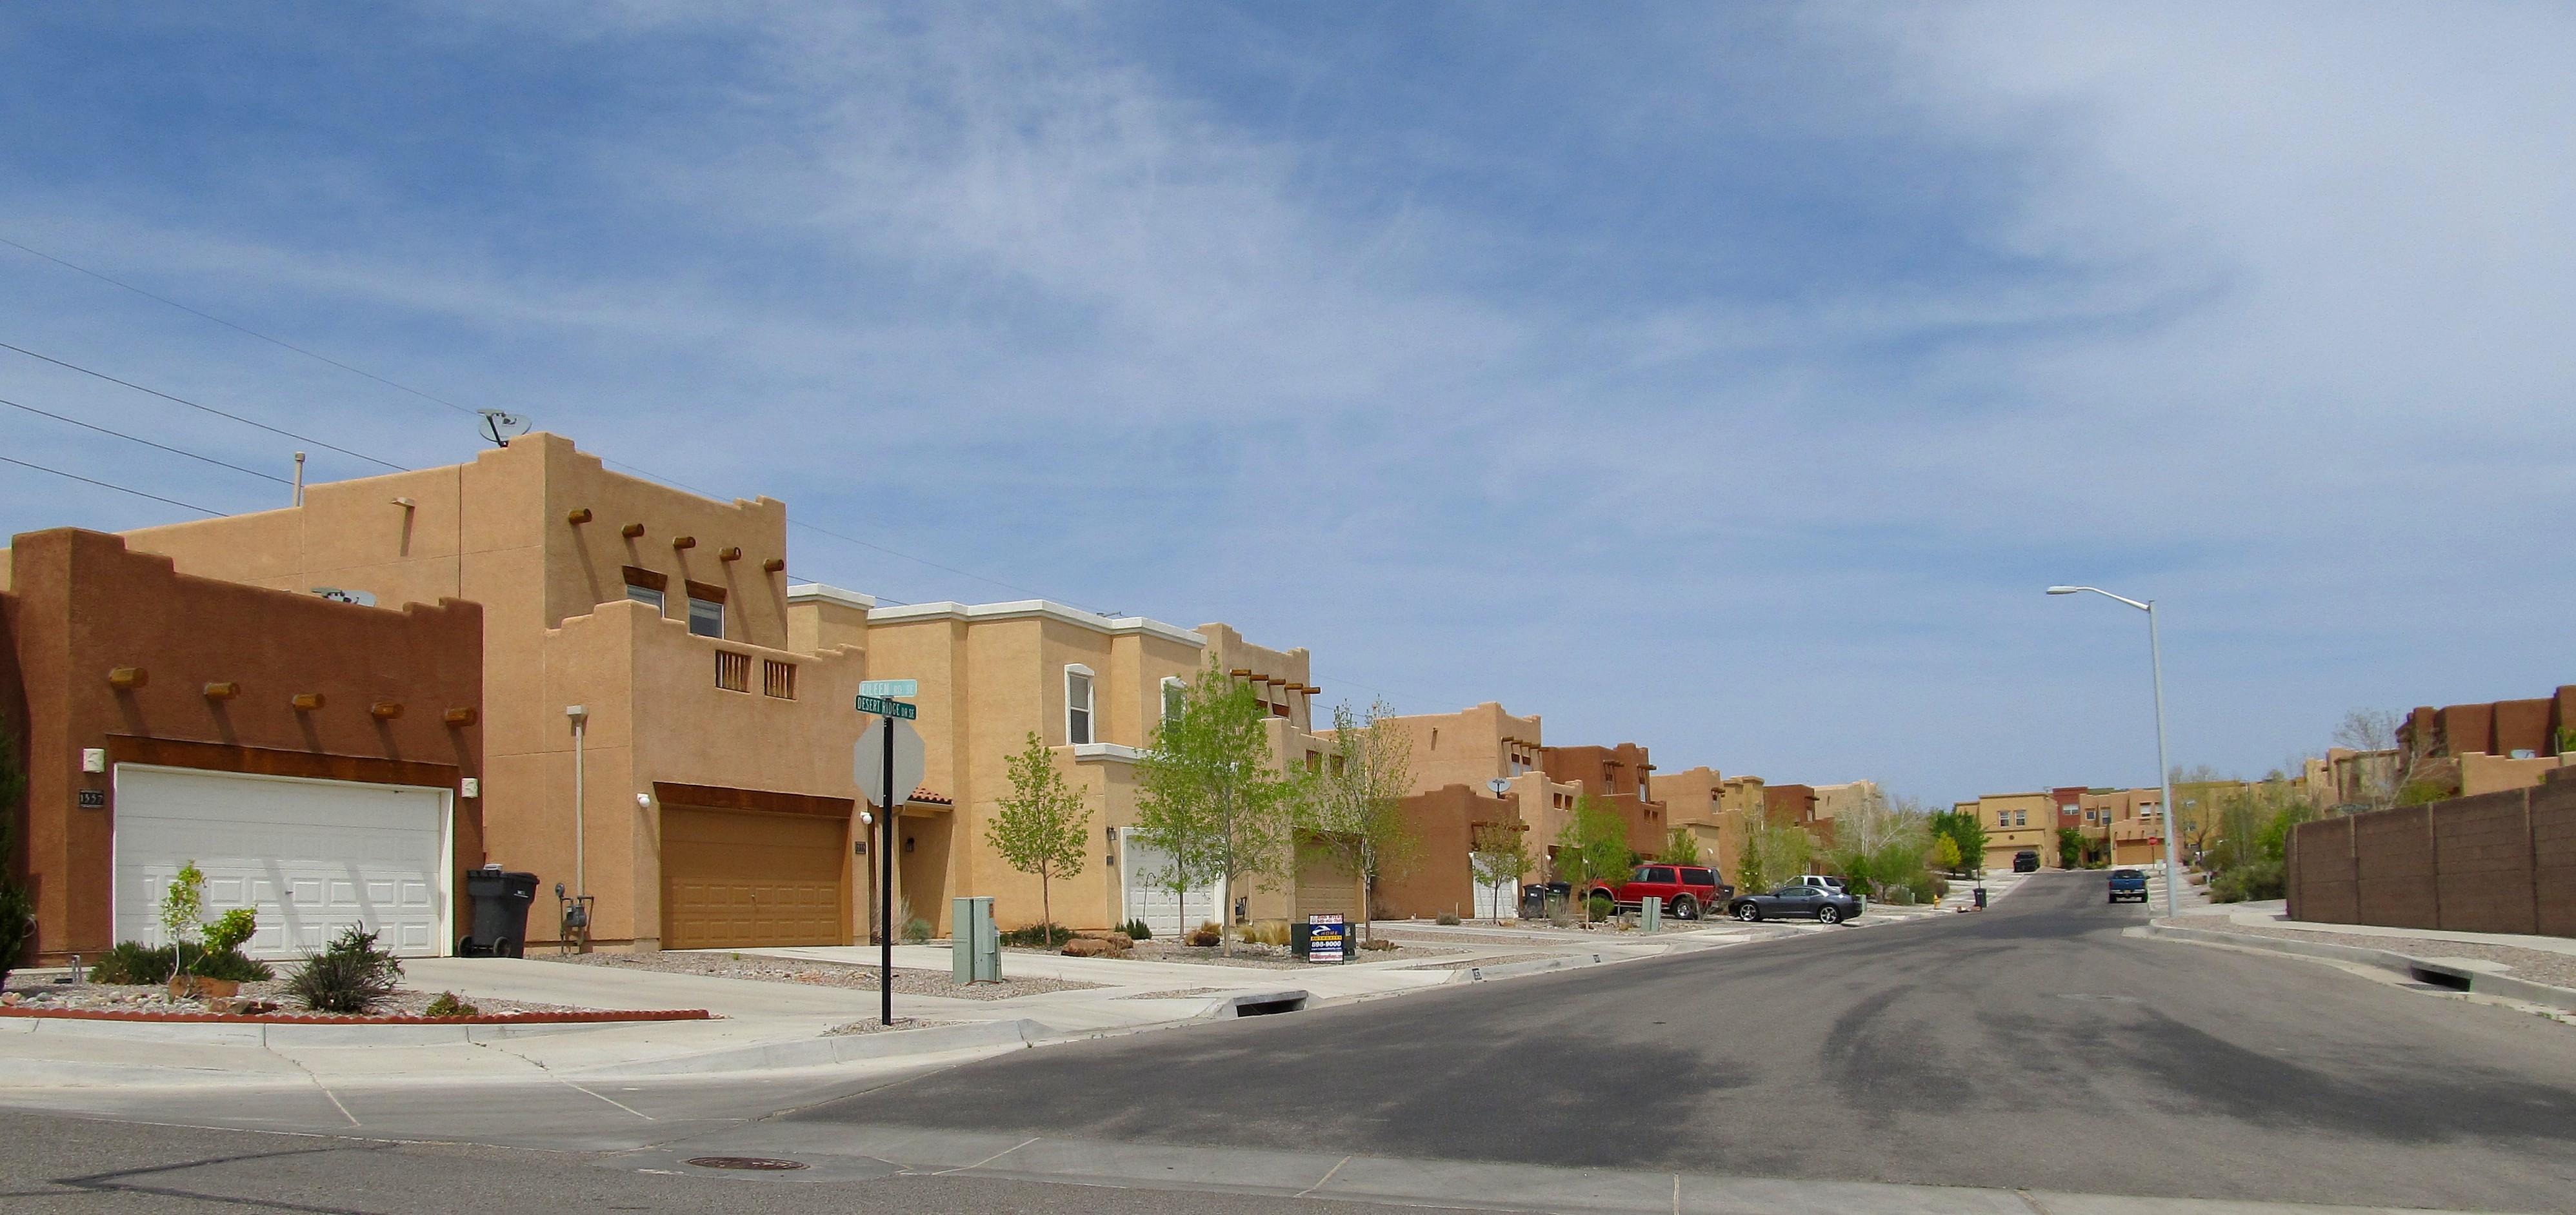 New Mexico Rio Rancho Homes For Sale